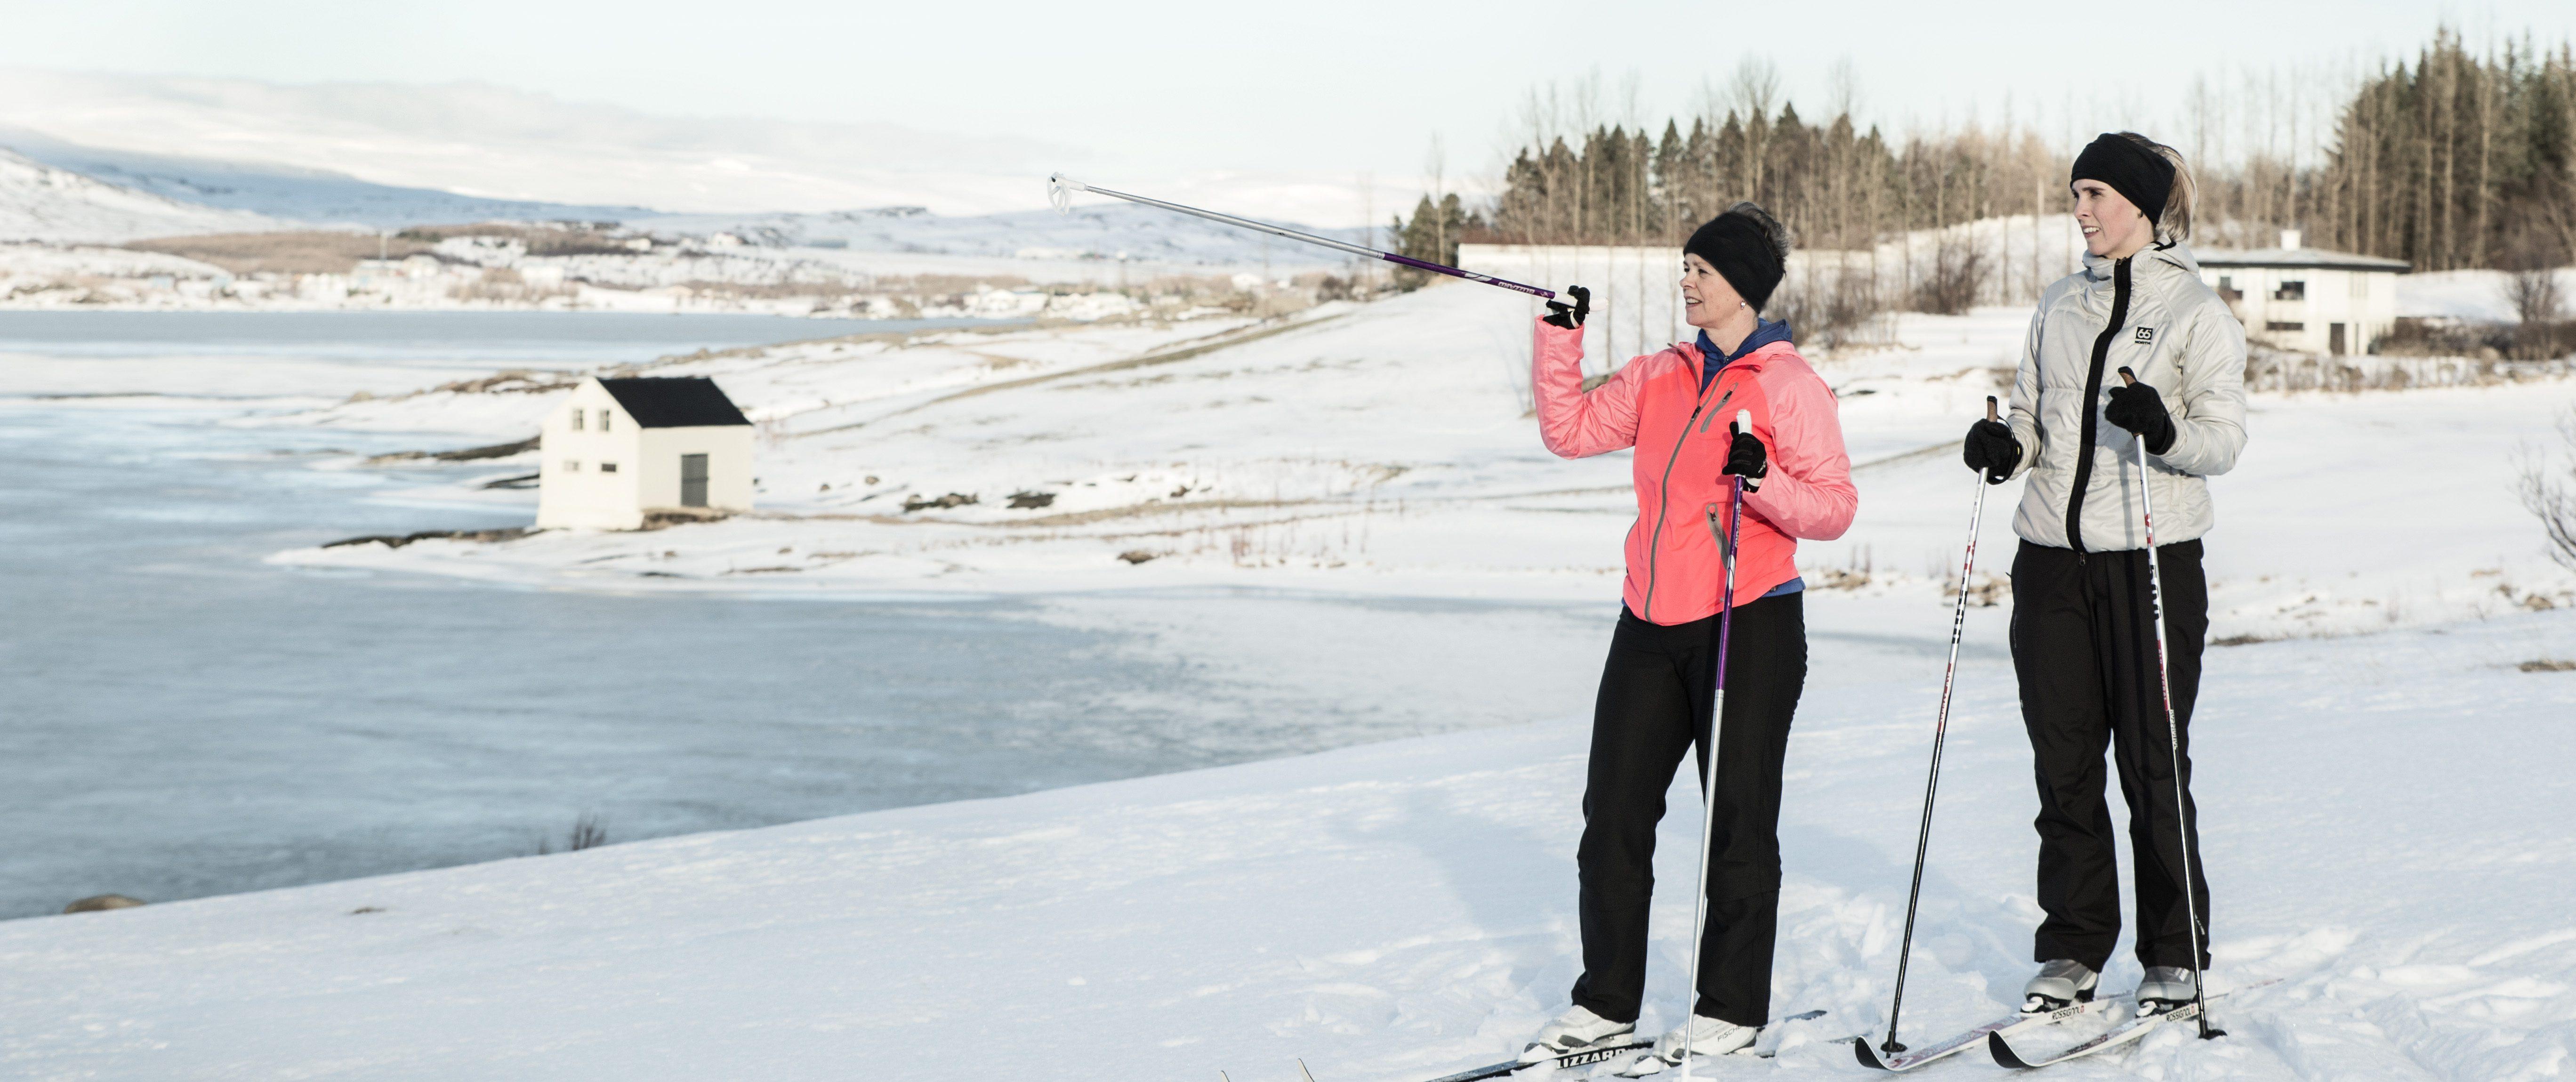 ostisland-langlauf-lakehotel-panorama